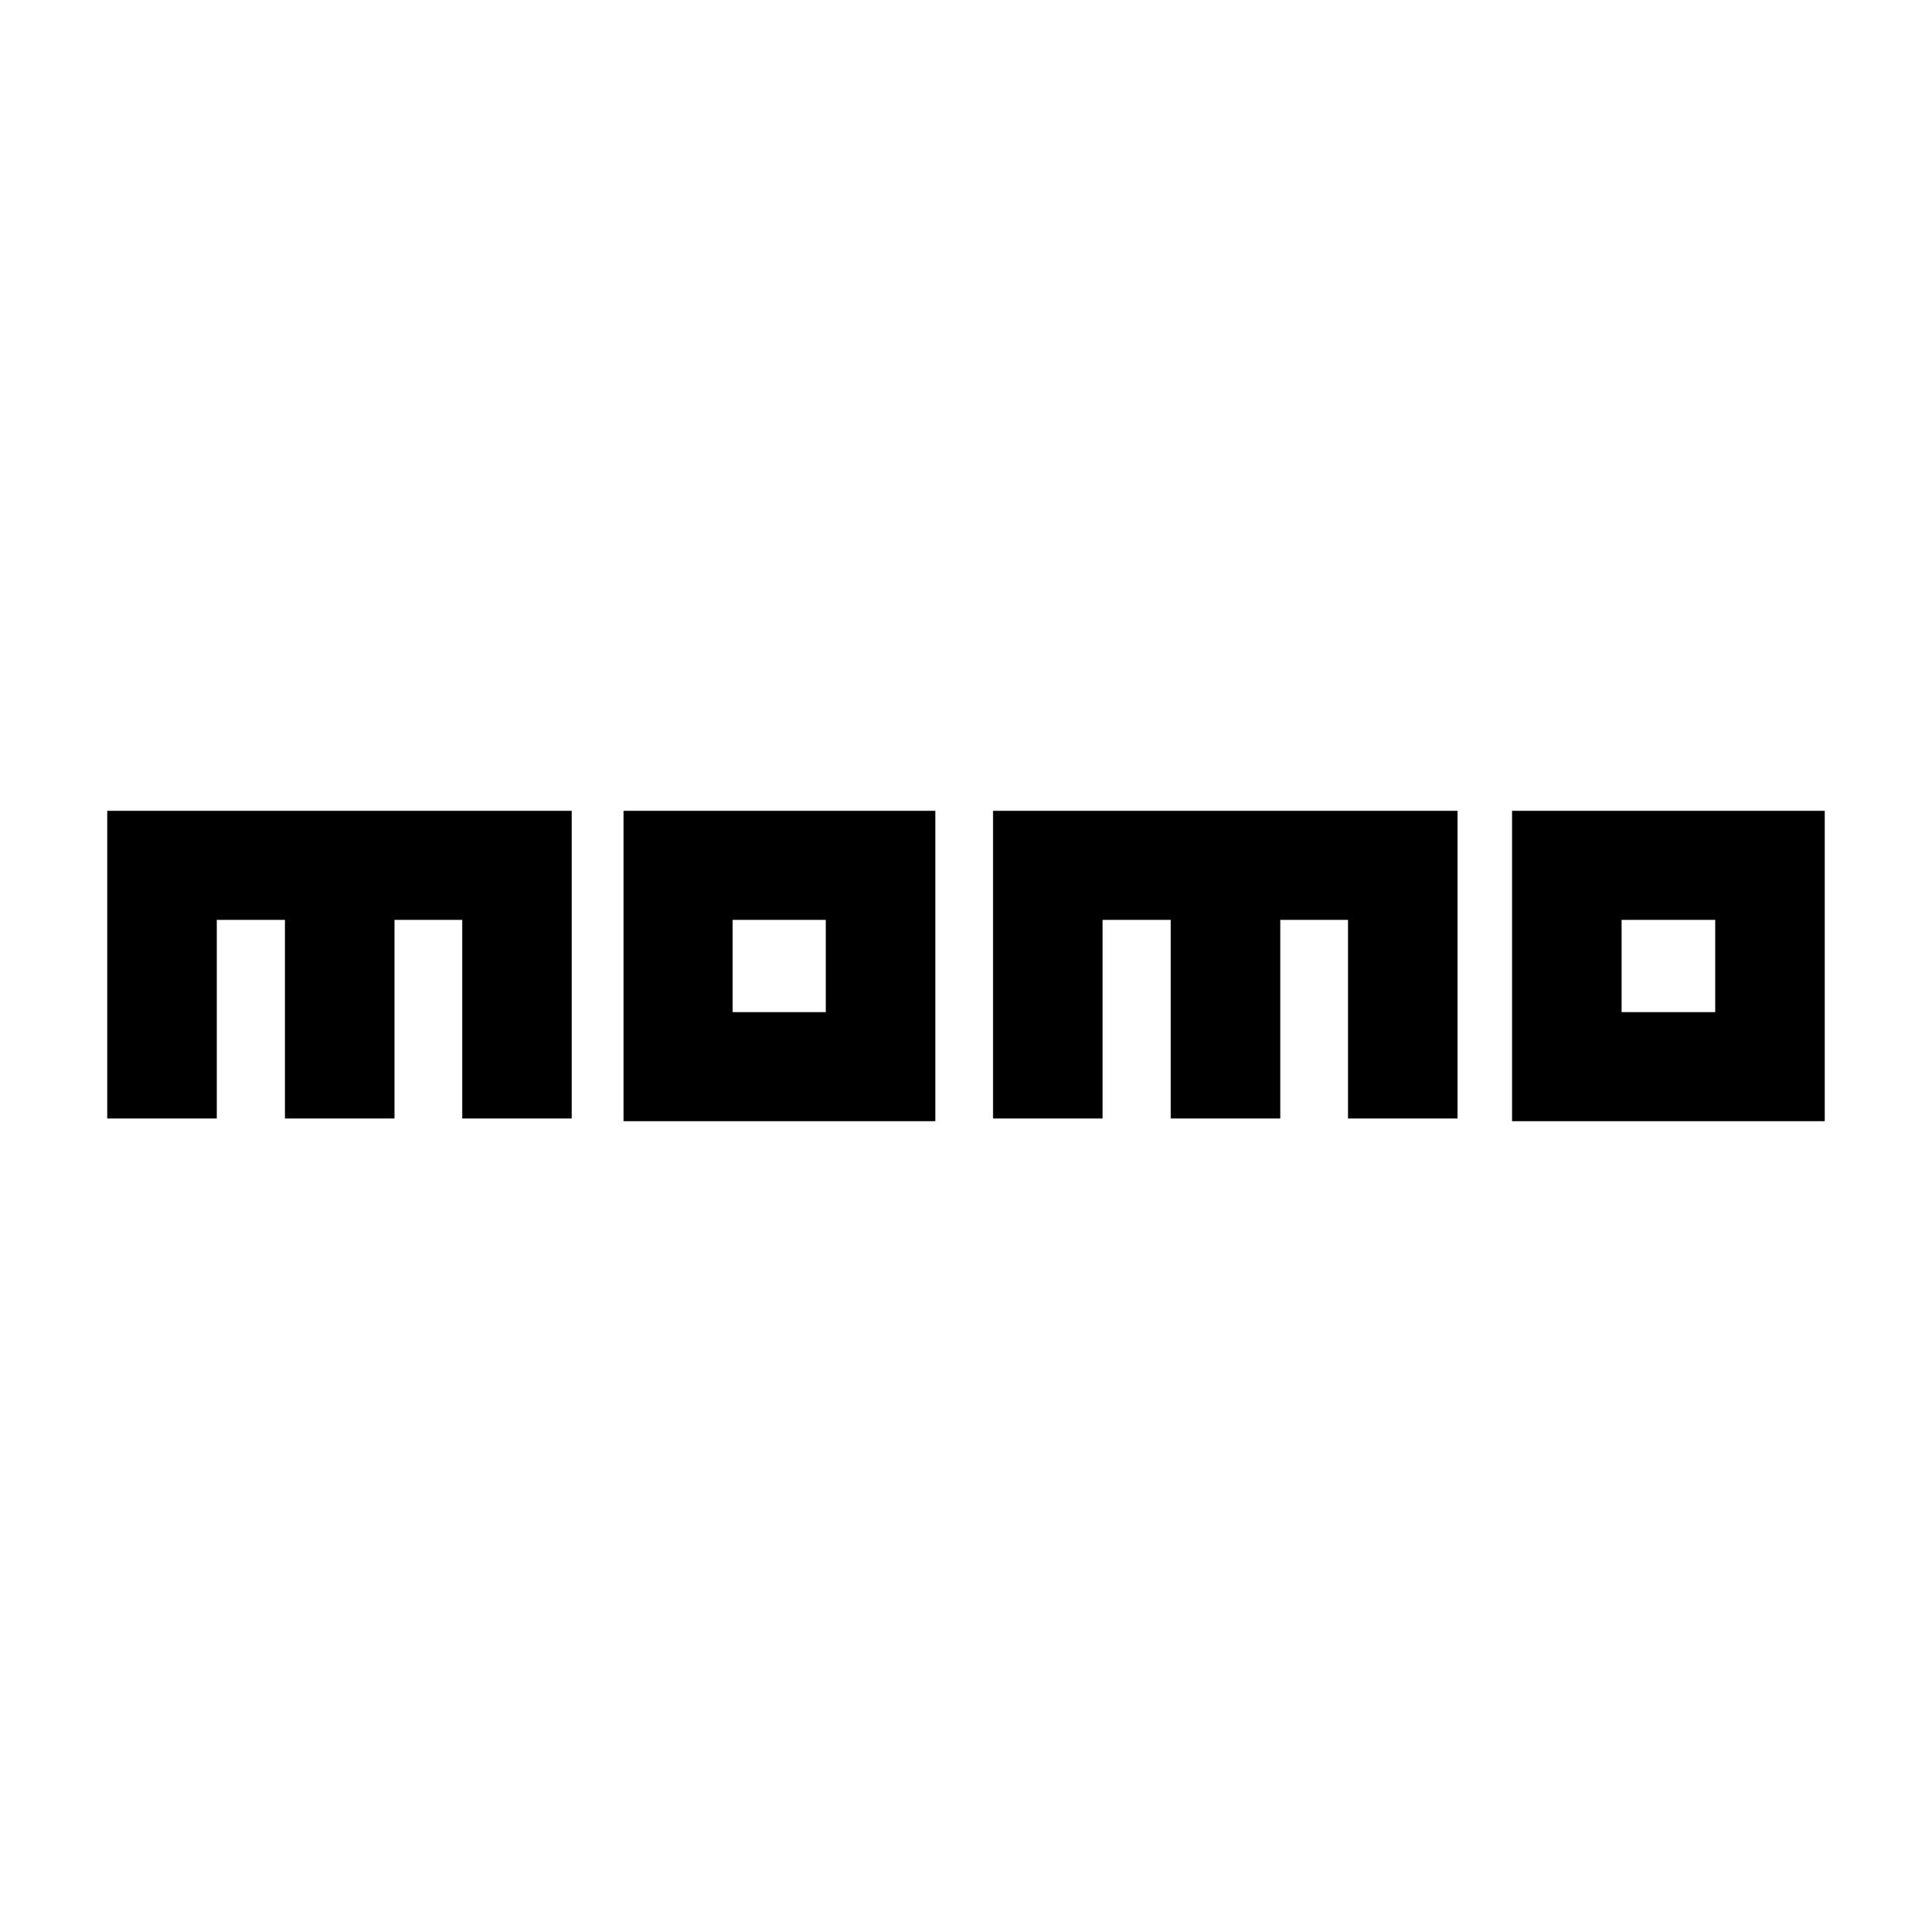 sticker momo ref 1 tuning audio sonorisation car auto moto camion competition deco rallye autocollant